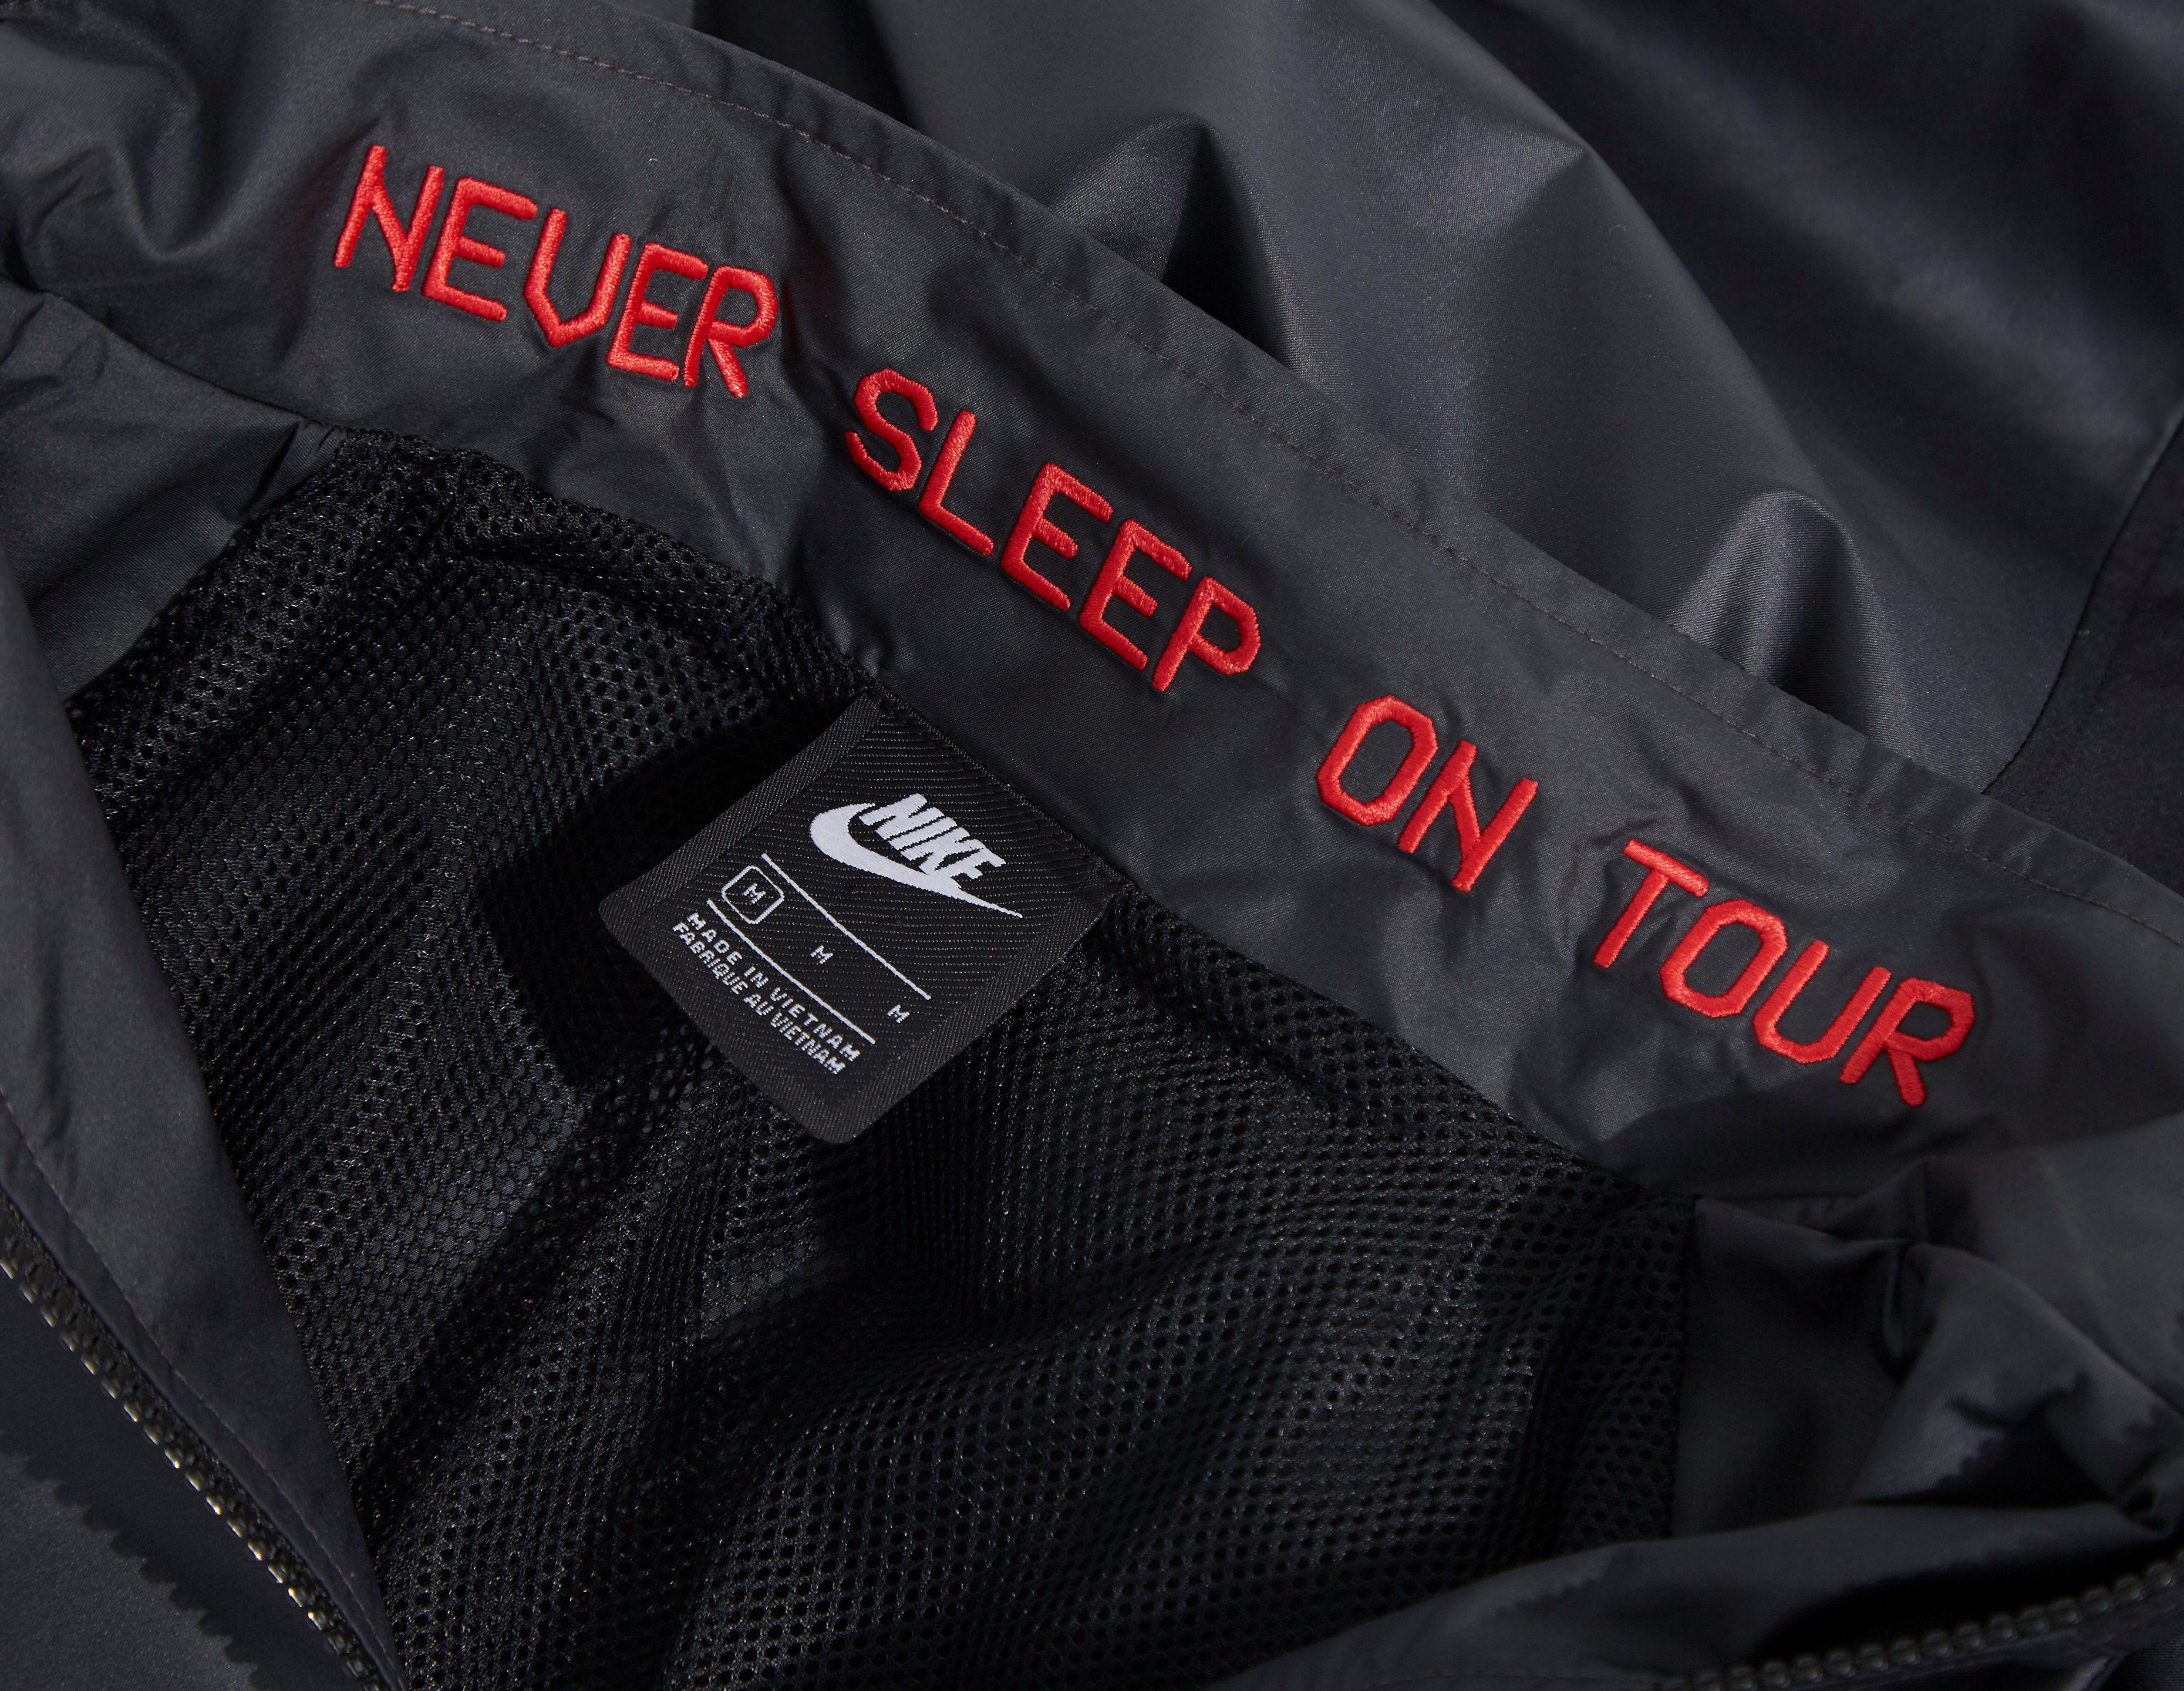 Nike x Skepta SK Air Tracksuit